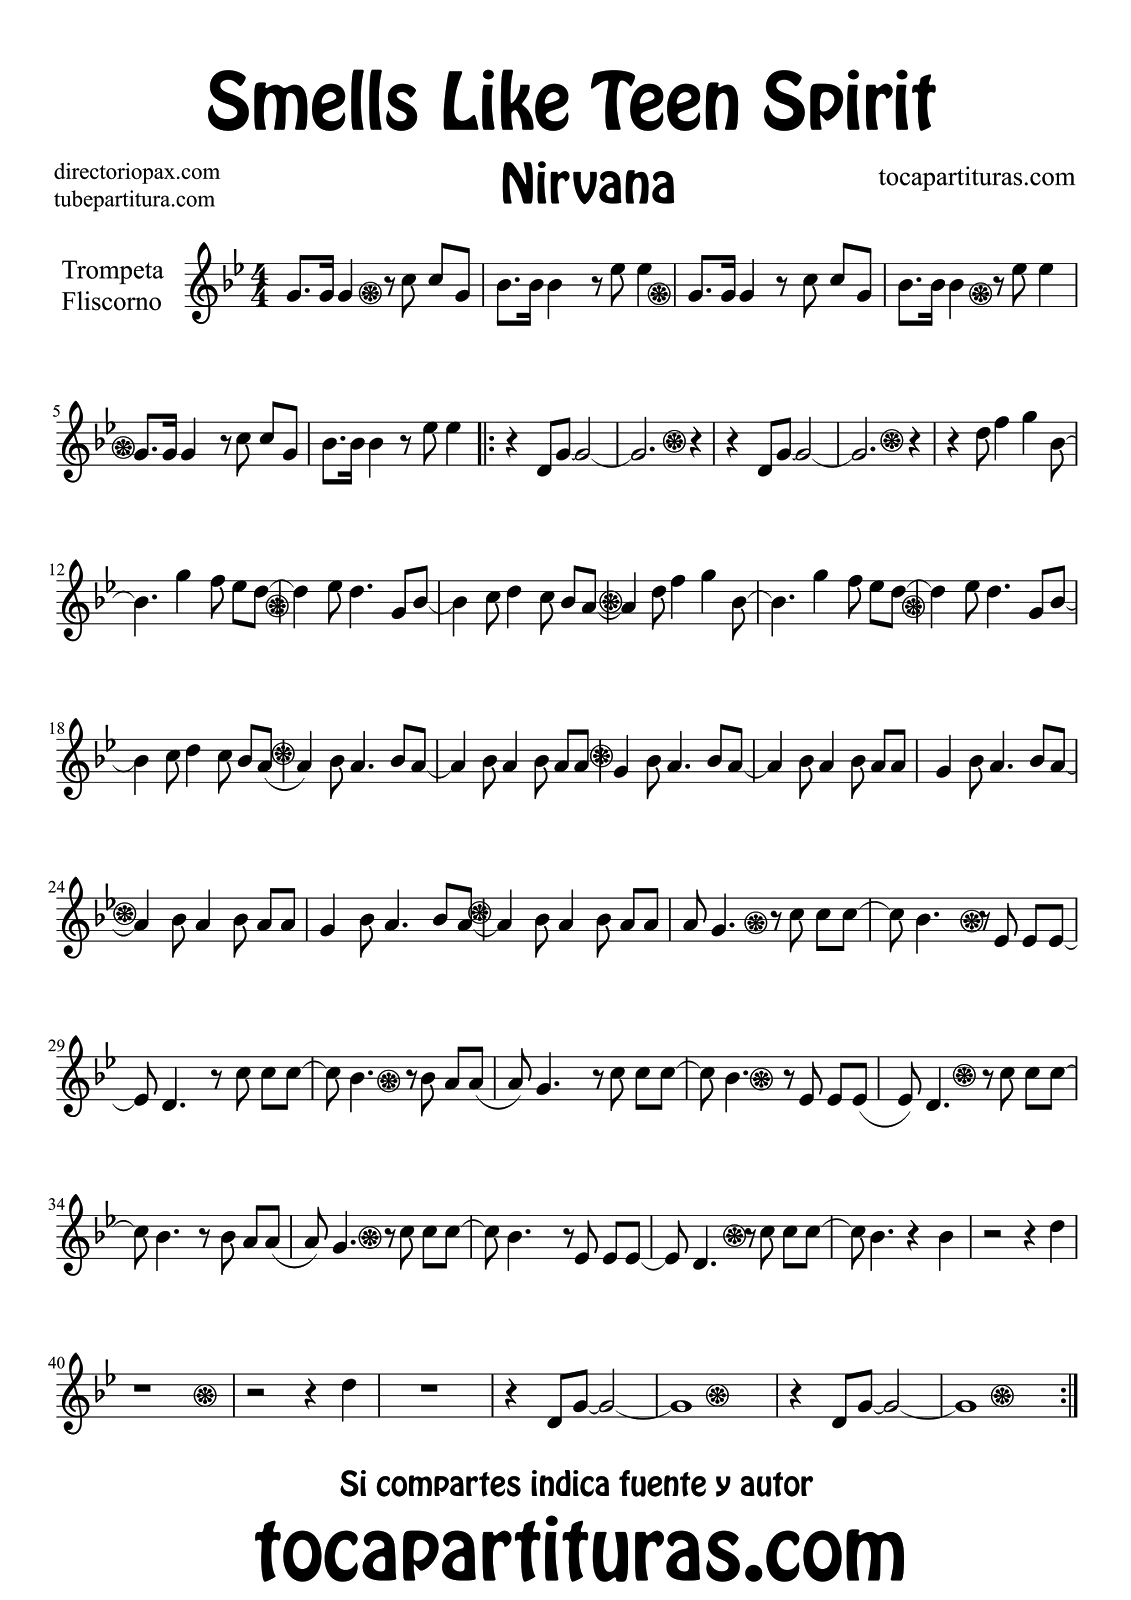 Diegosax Smells Like Teen Spirit De Nirvana Partitura De Flauta Violín Saxofón Alto Trompeta Viola Oboe Clarinete Saxo Tenor Soprano Sax Trombón Fliscorno Violonchelo Fagot Barítono Bombardino Trompa Tuba Elicón Y Corno